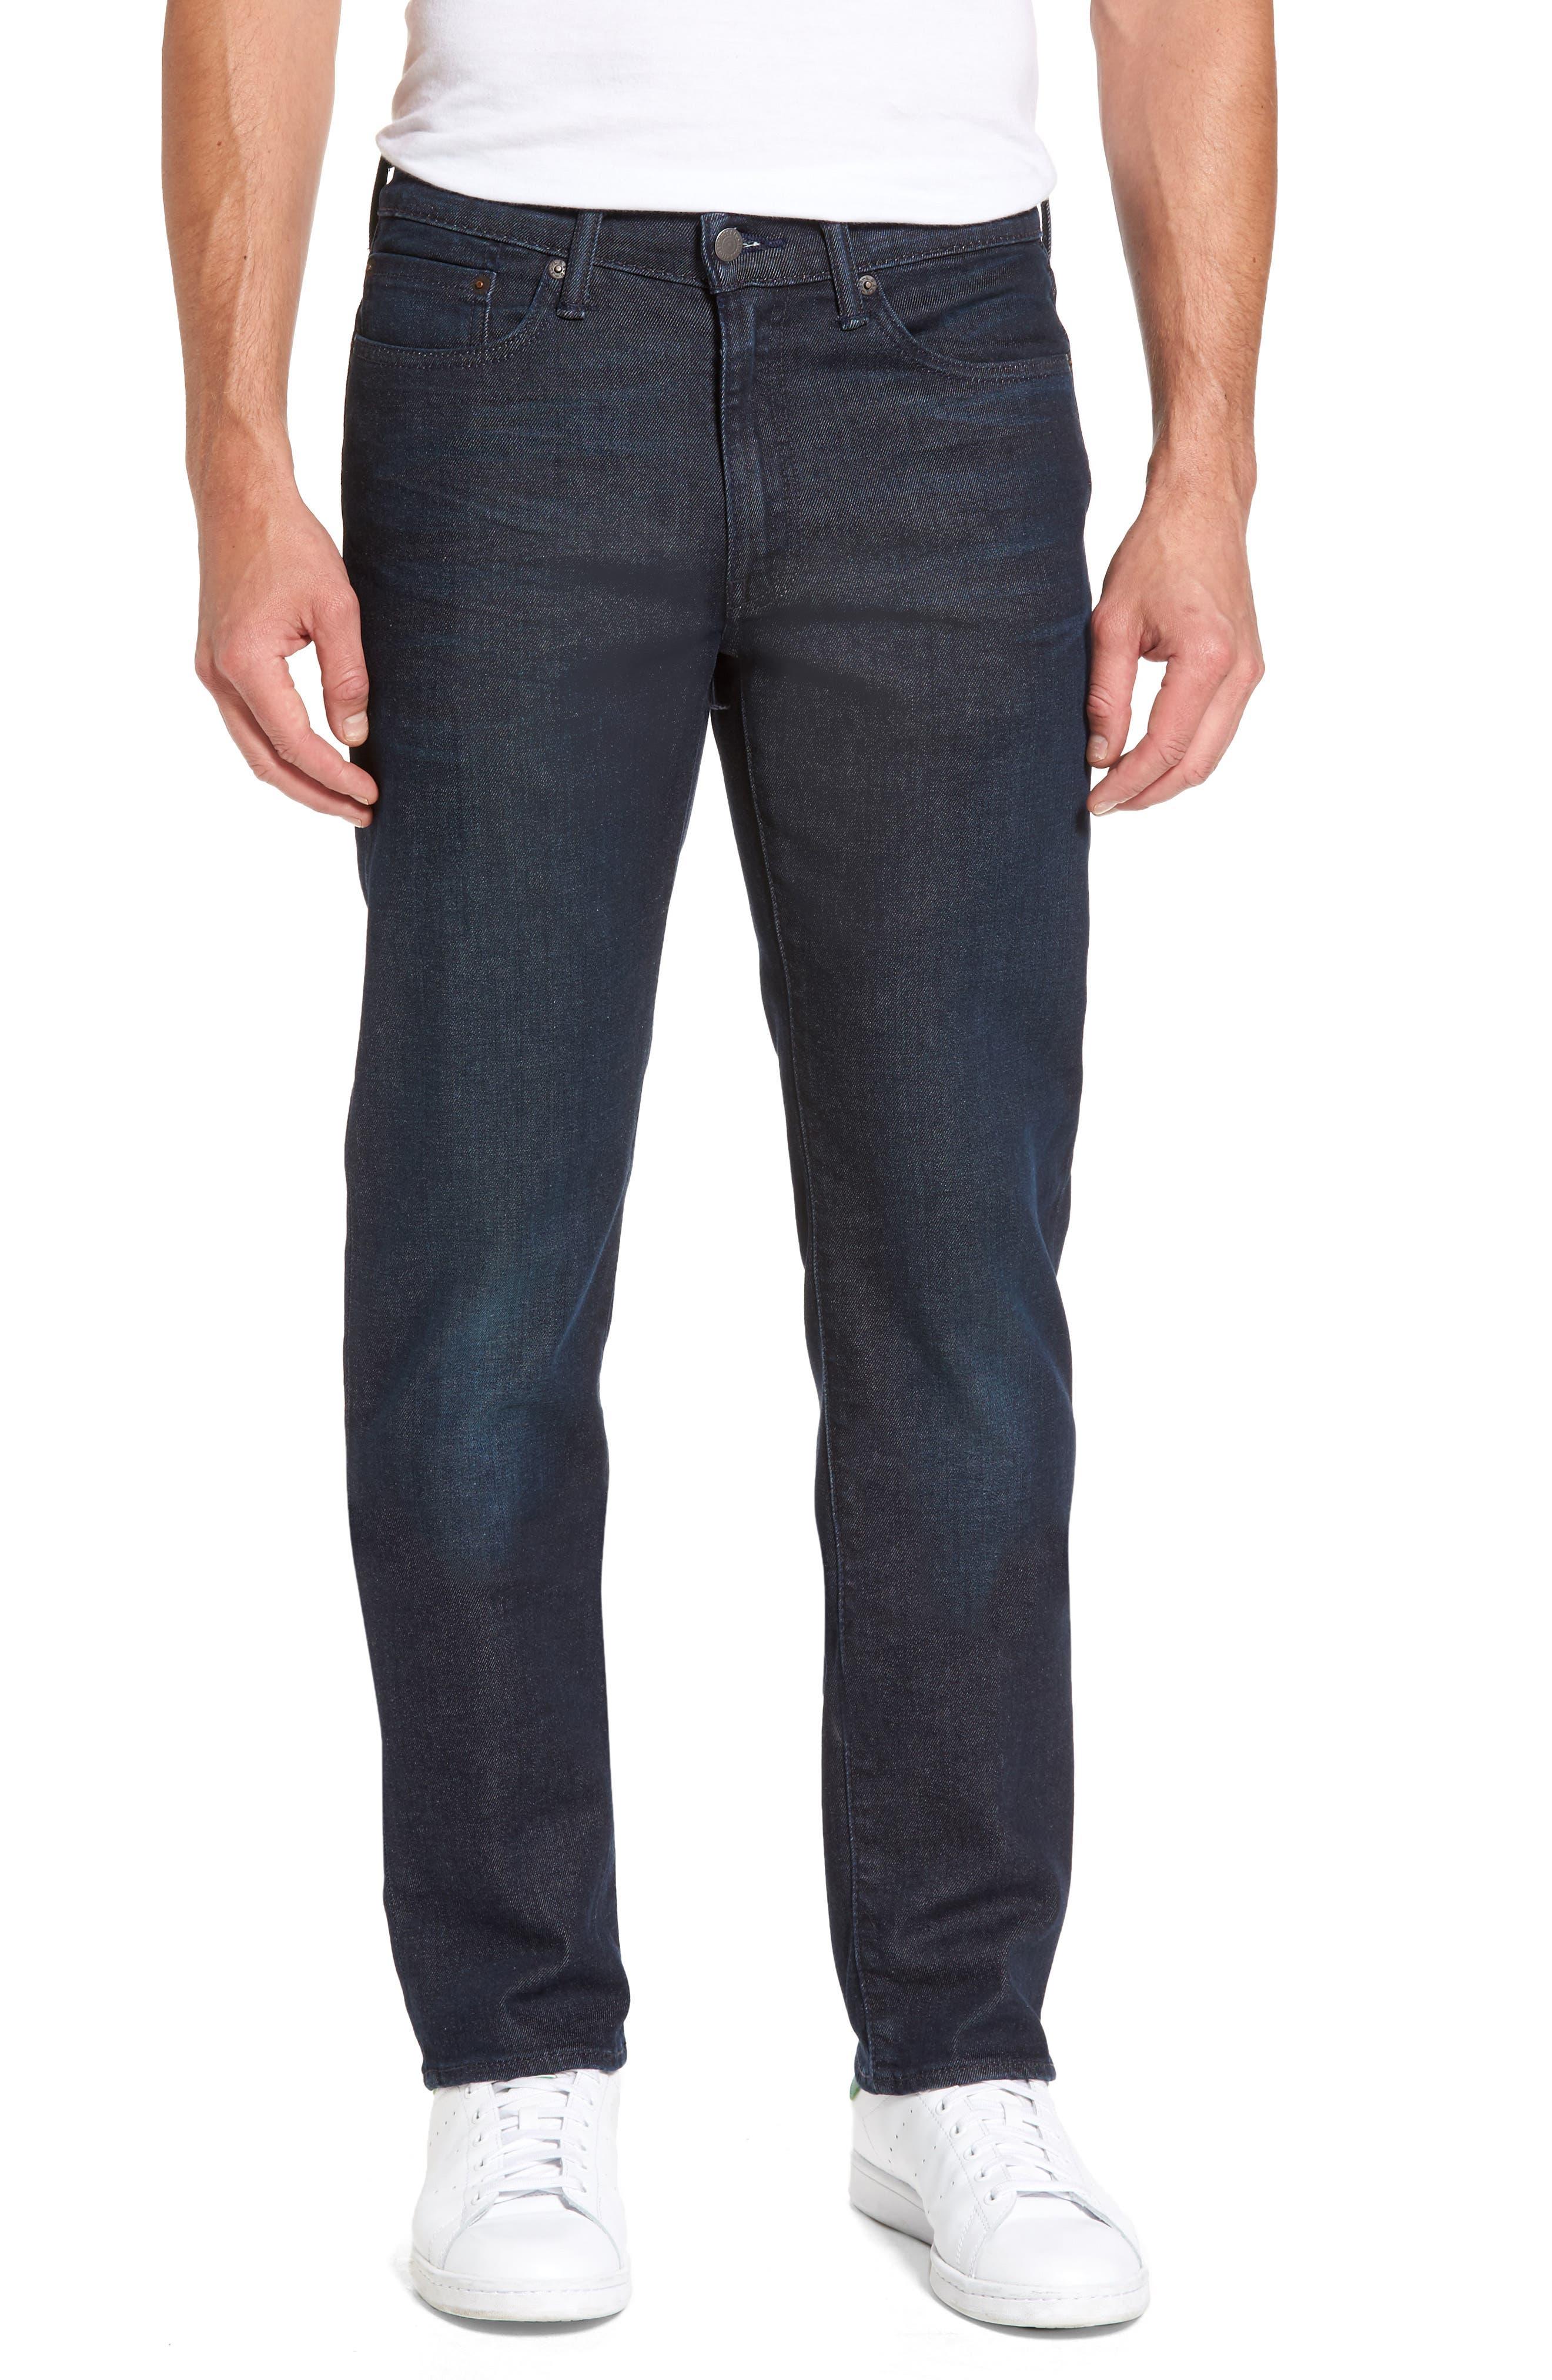 Main Image - Levi's® 514™ Straight Leg Jeans (Stump Town)